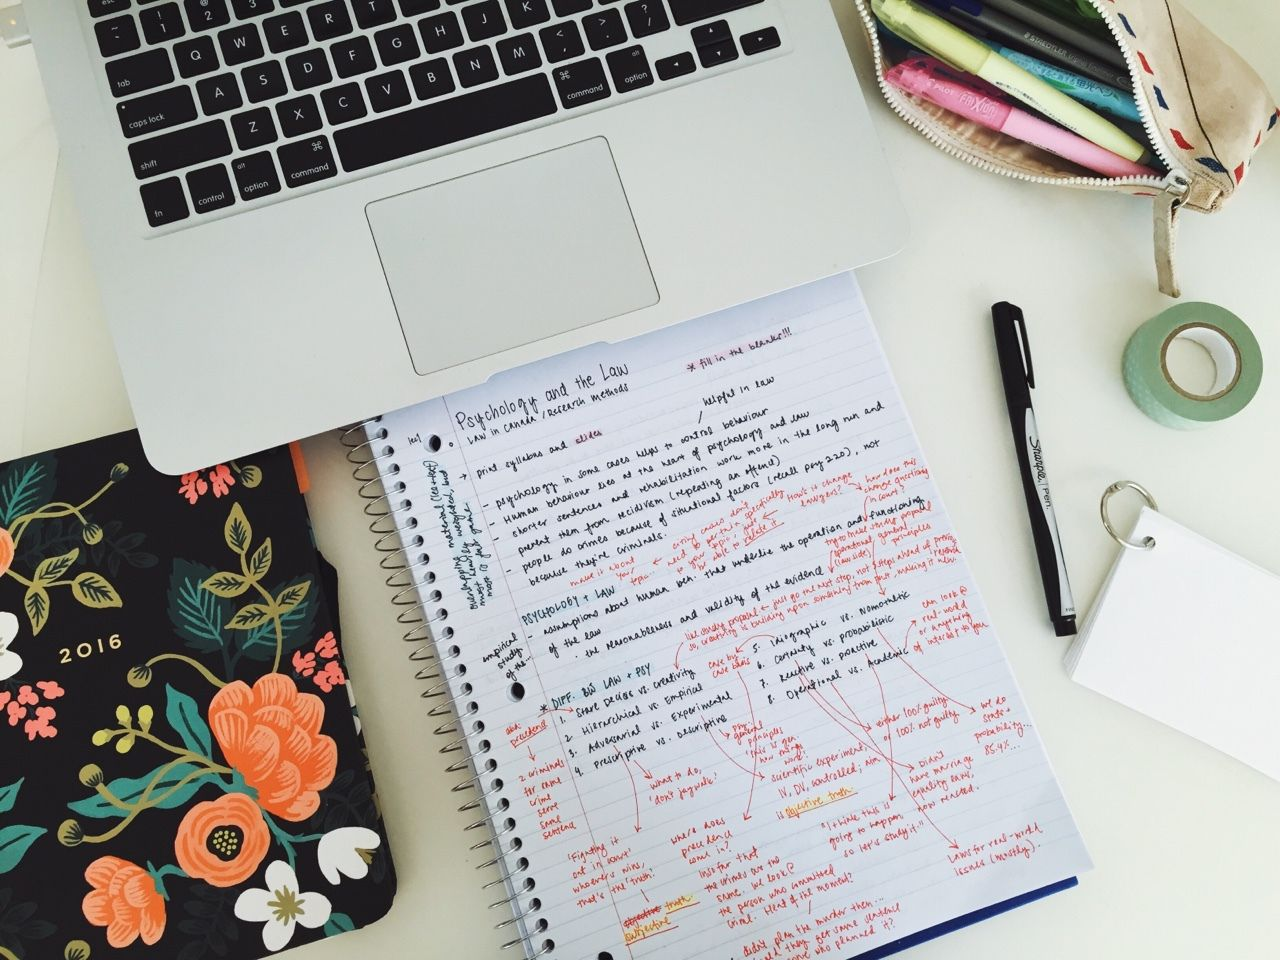 Marvelous essays discount code